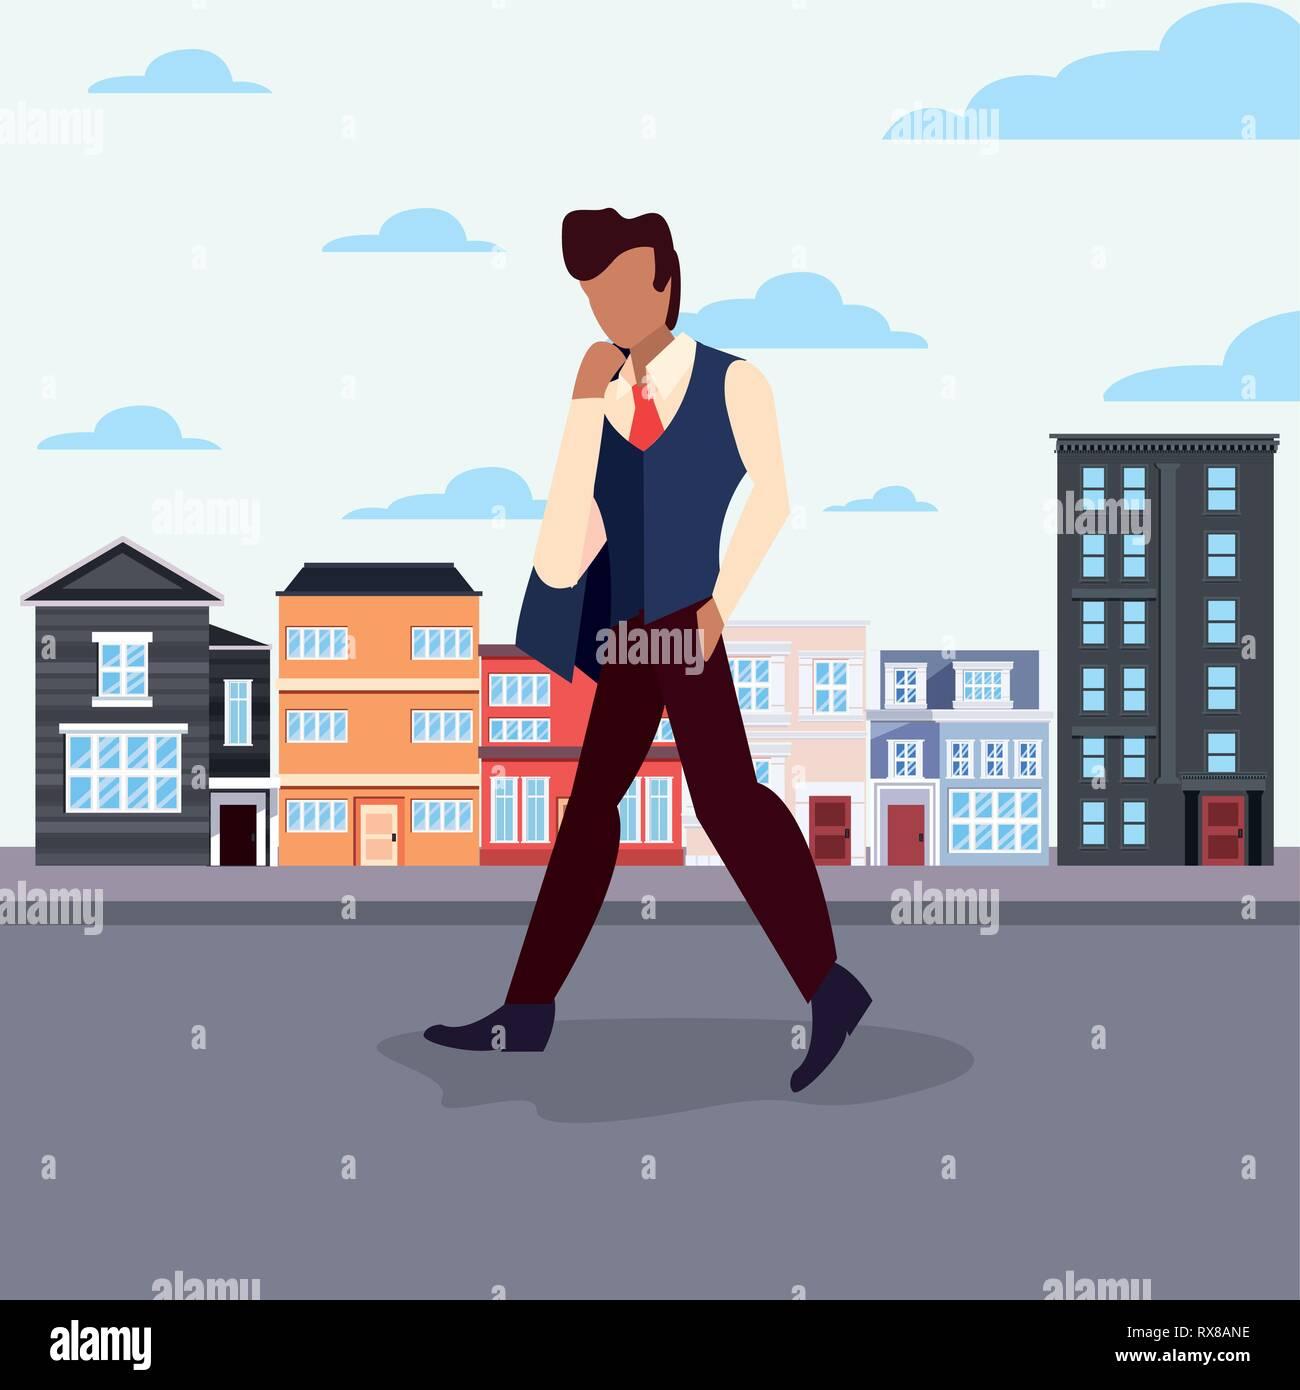 man walking in the city street activity vector illustration - Stock Vector